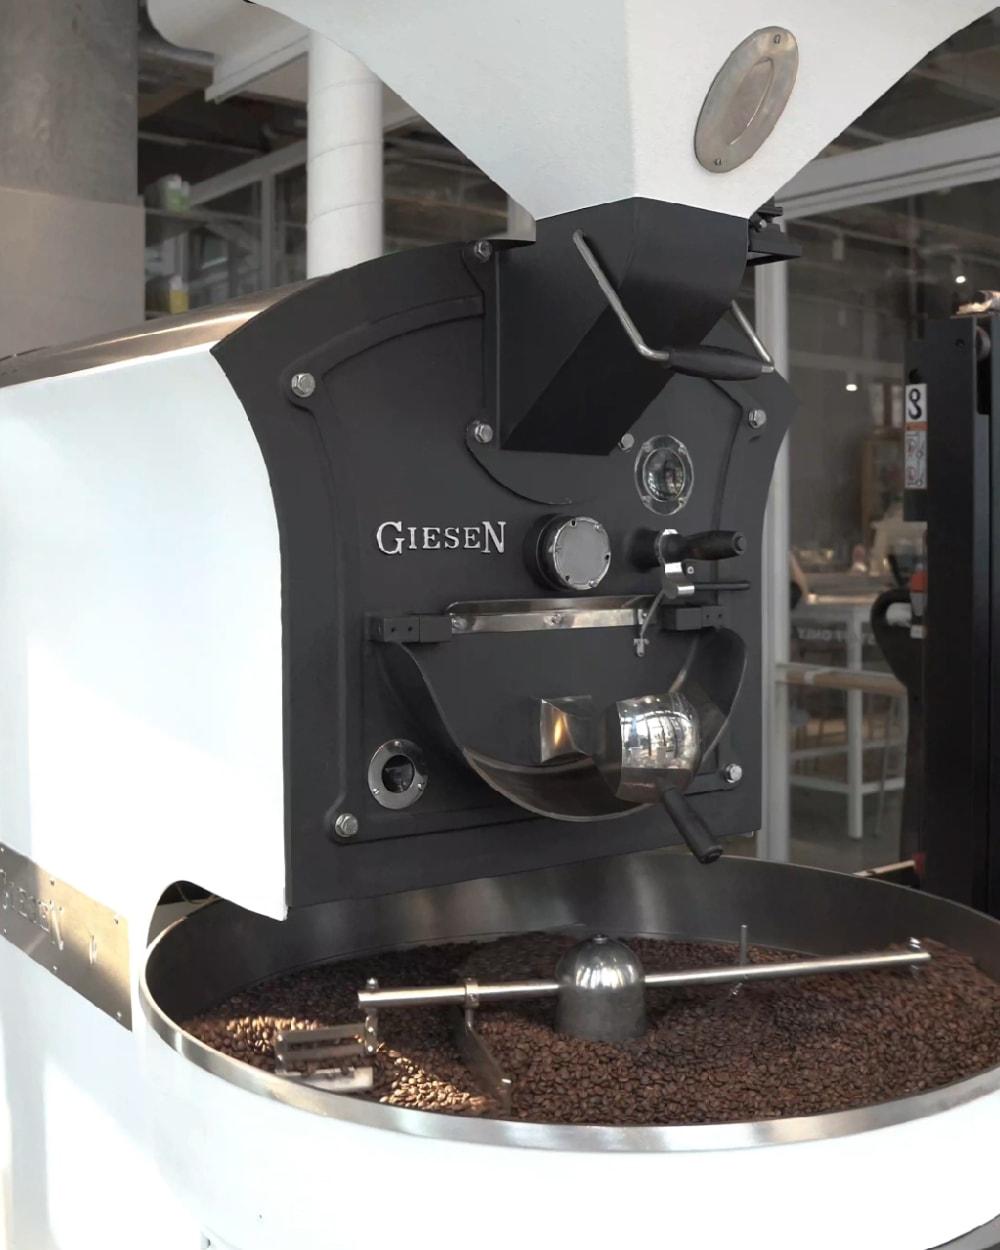 Giesen coffee roasting machine